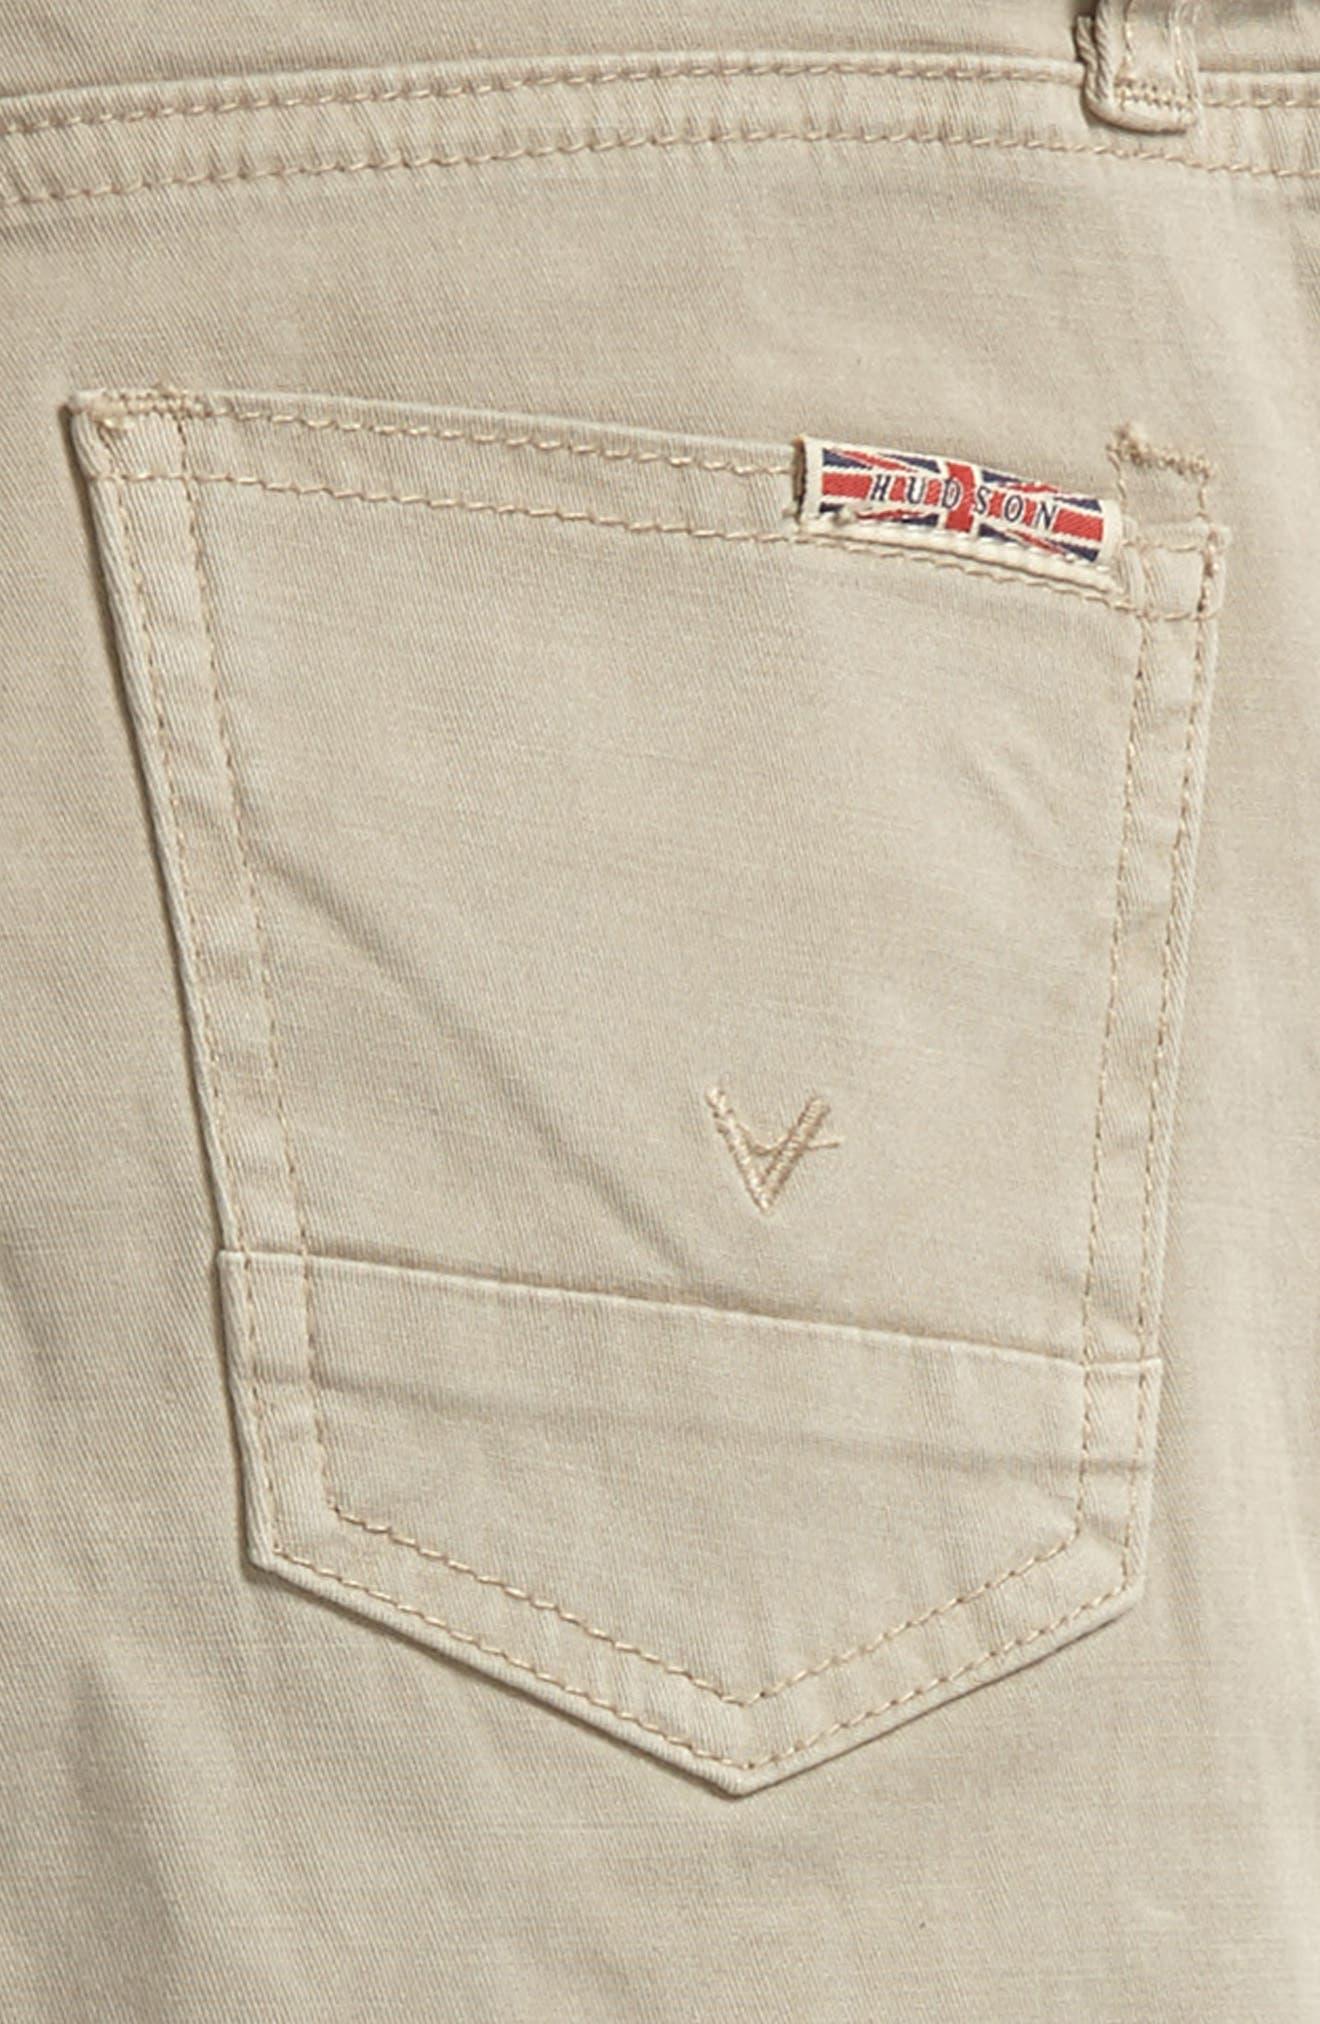 Hudson Jeans Jagger Slim Fit Straight Leg Pants,                             Alternate thumbnail 6, color,